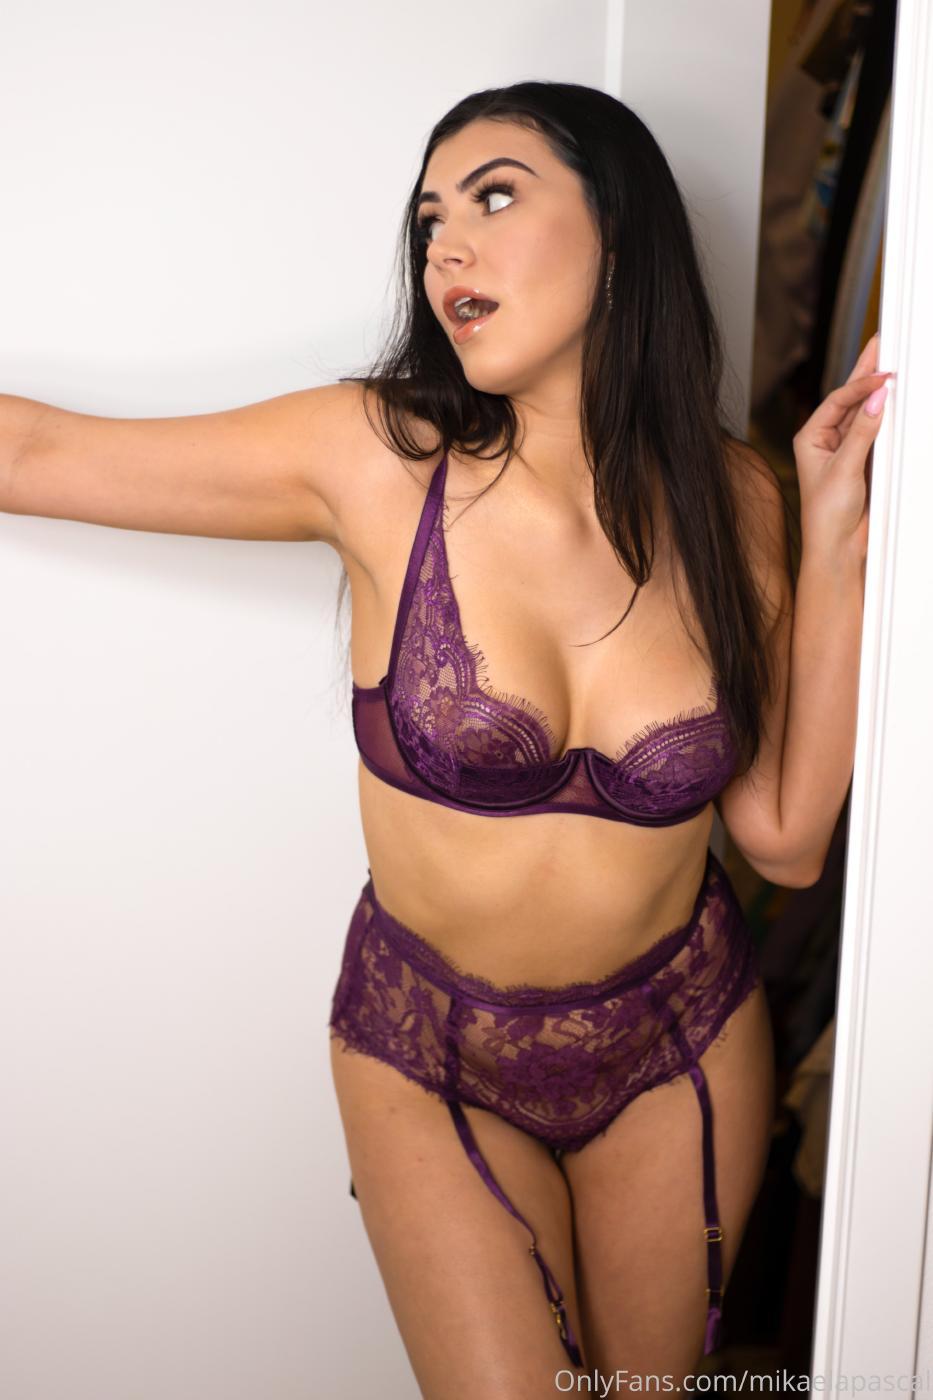 Mikaela Pascal Purple Lace Lingerie Onlyfans Set Leaked Yjbjpv